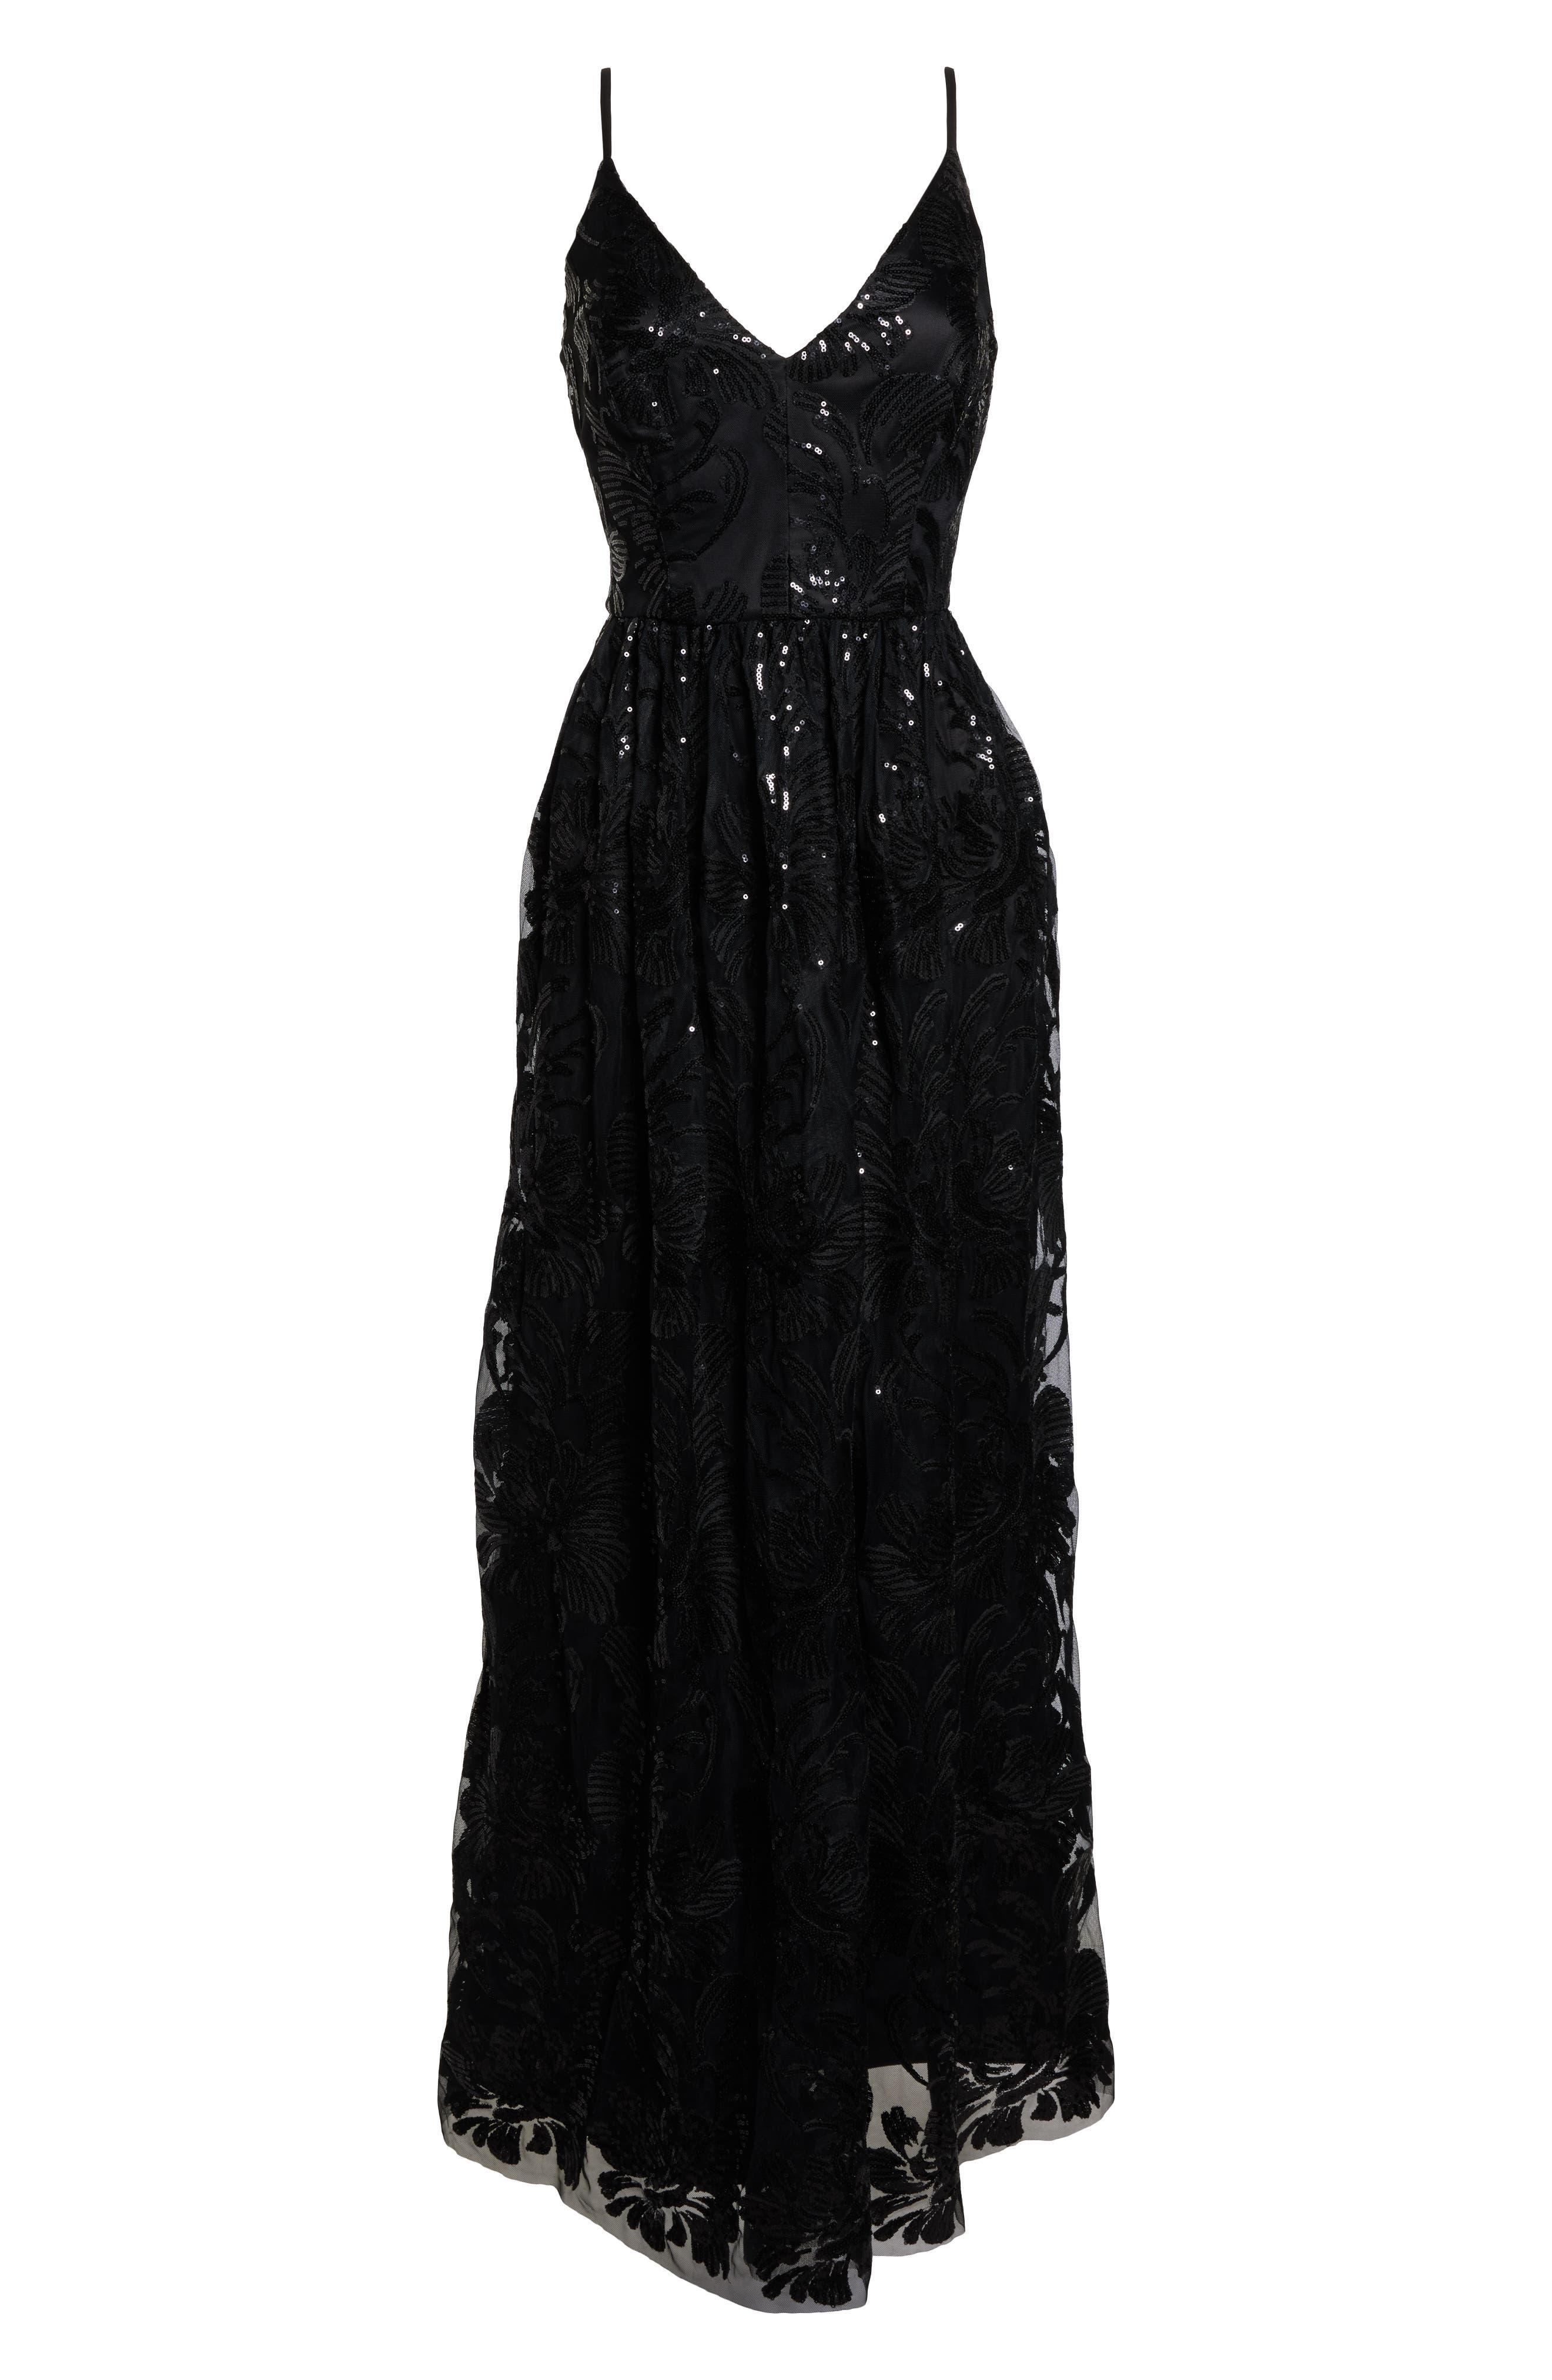 ELIZA J, Sequin Embroidered Mesh Evening Dress, Alternate thumbnail 7, color, BLACK